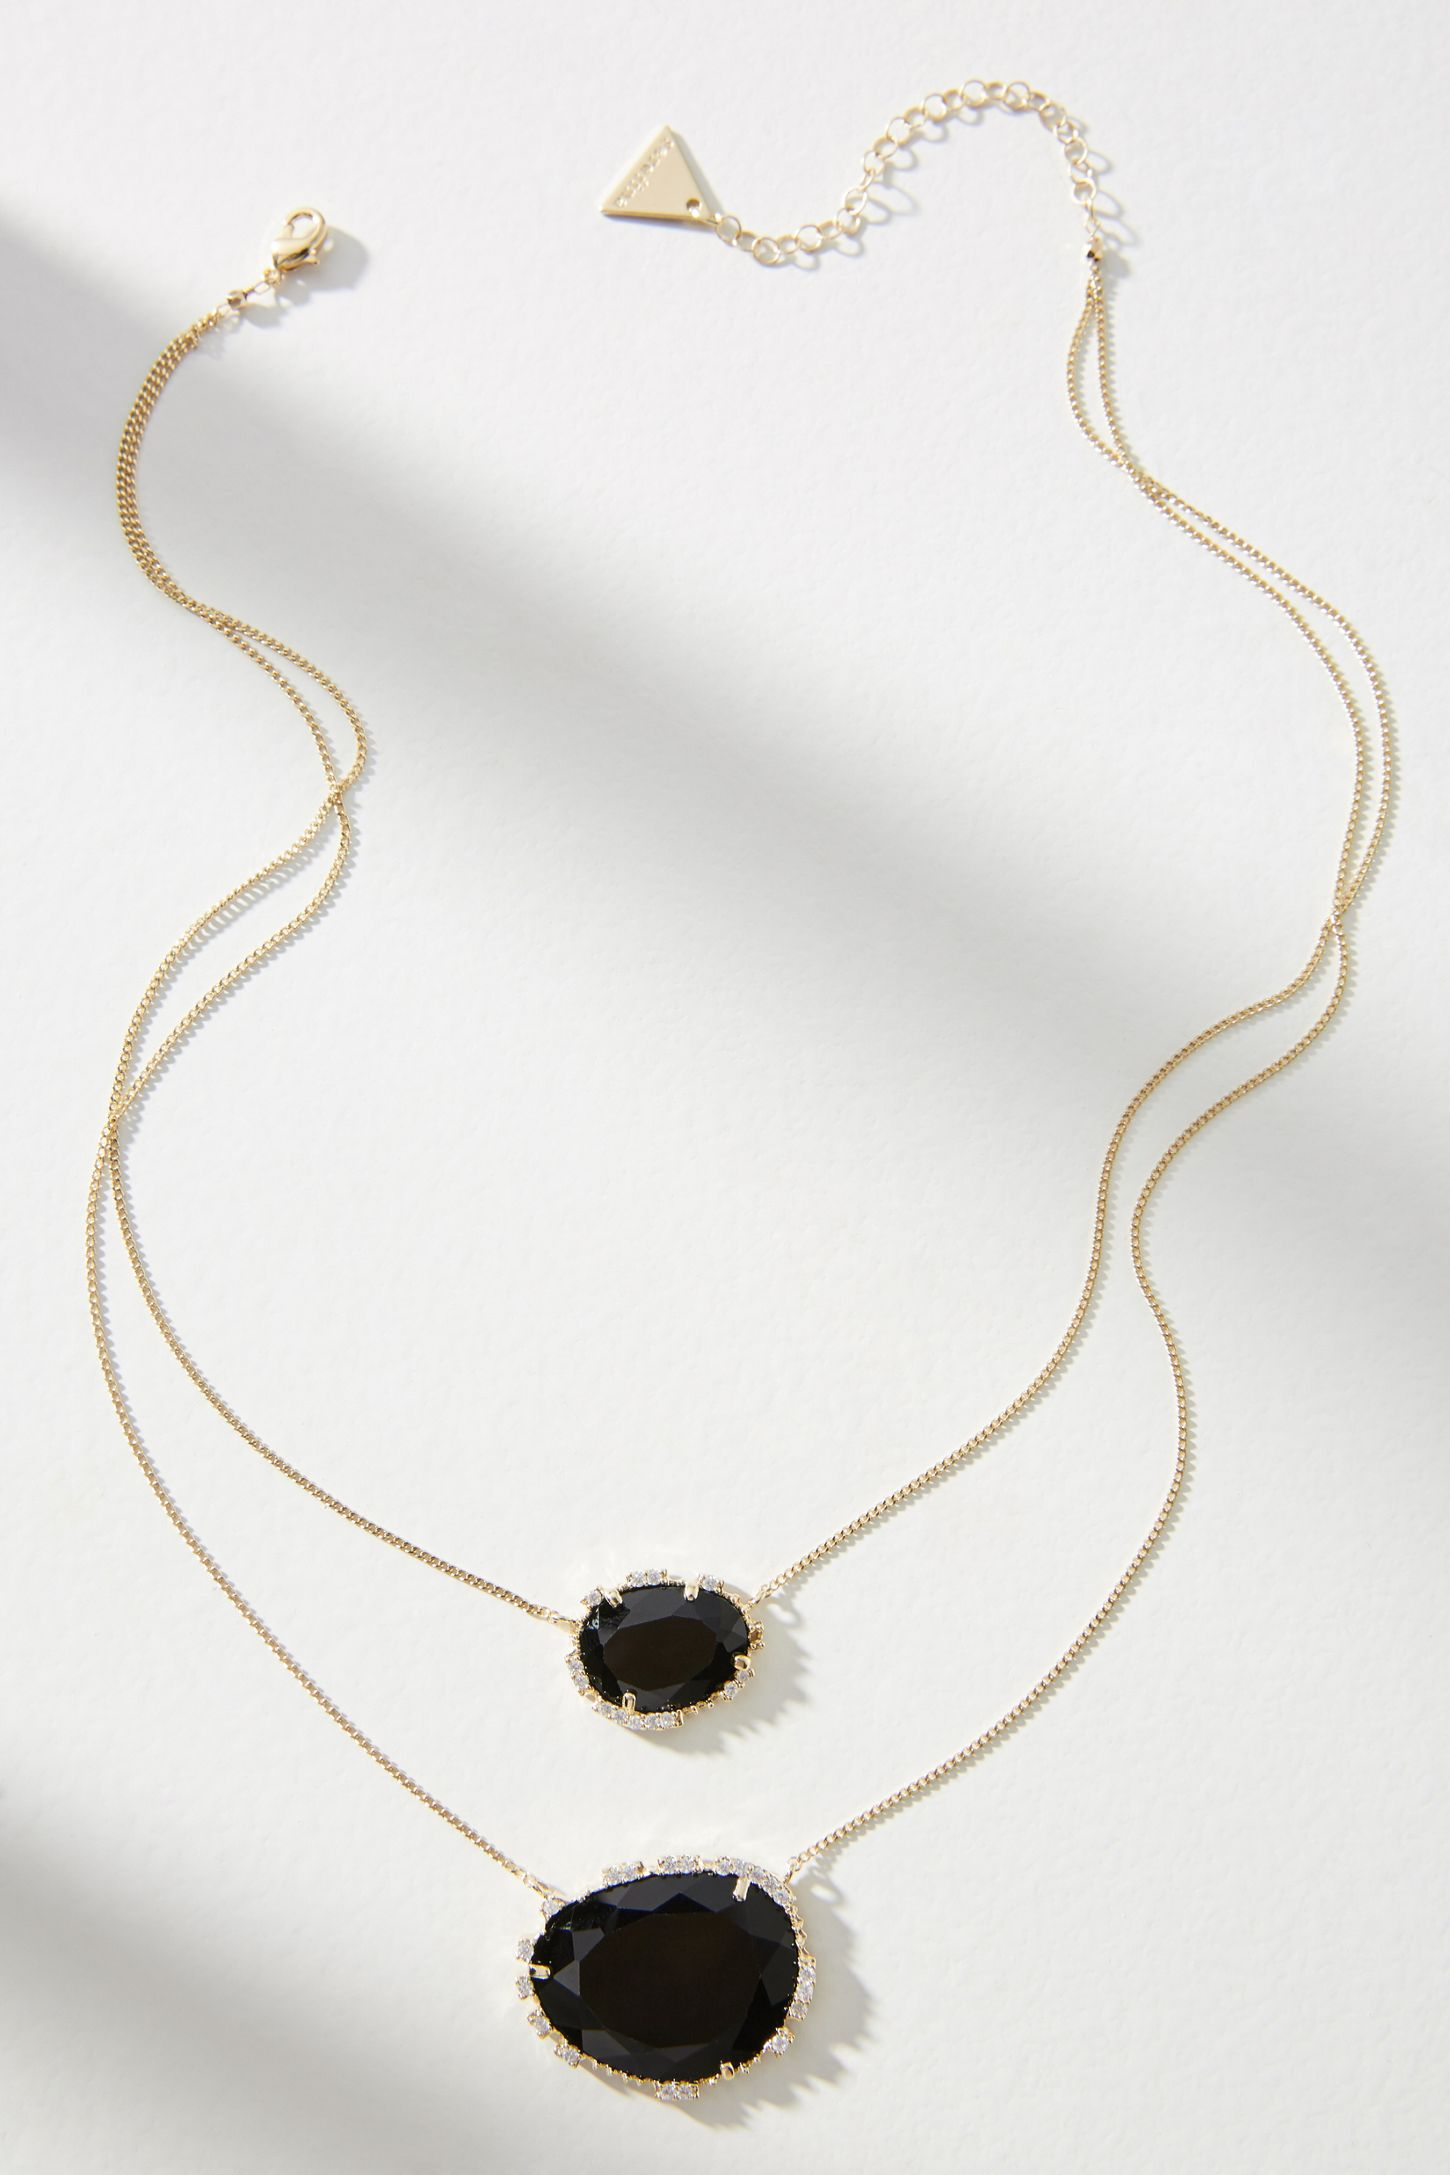 Double stone pendant necklace anthropologie slide view 2 double stone pendant necklace mozeypictures Choice Image